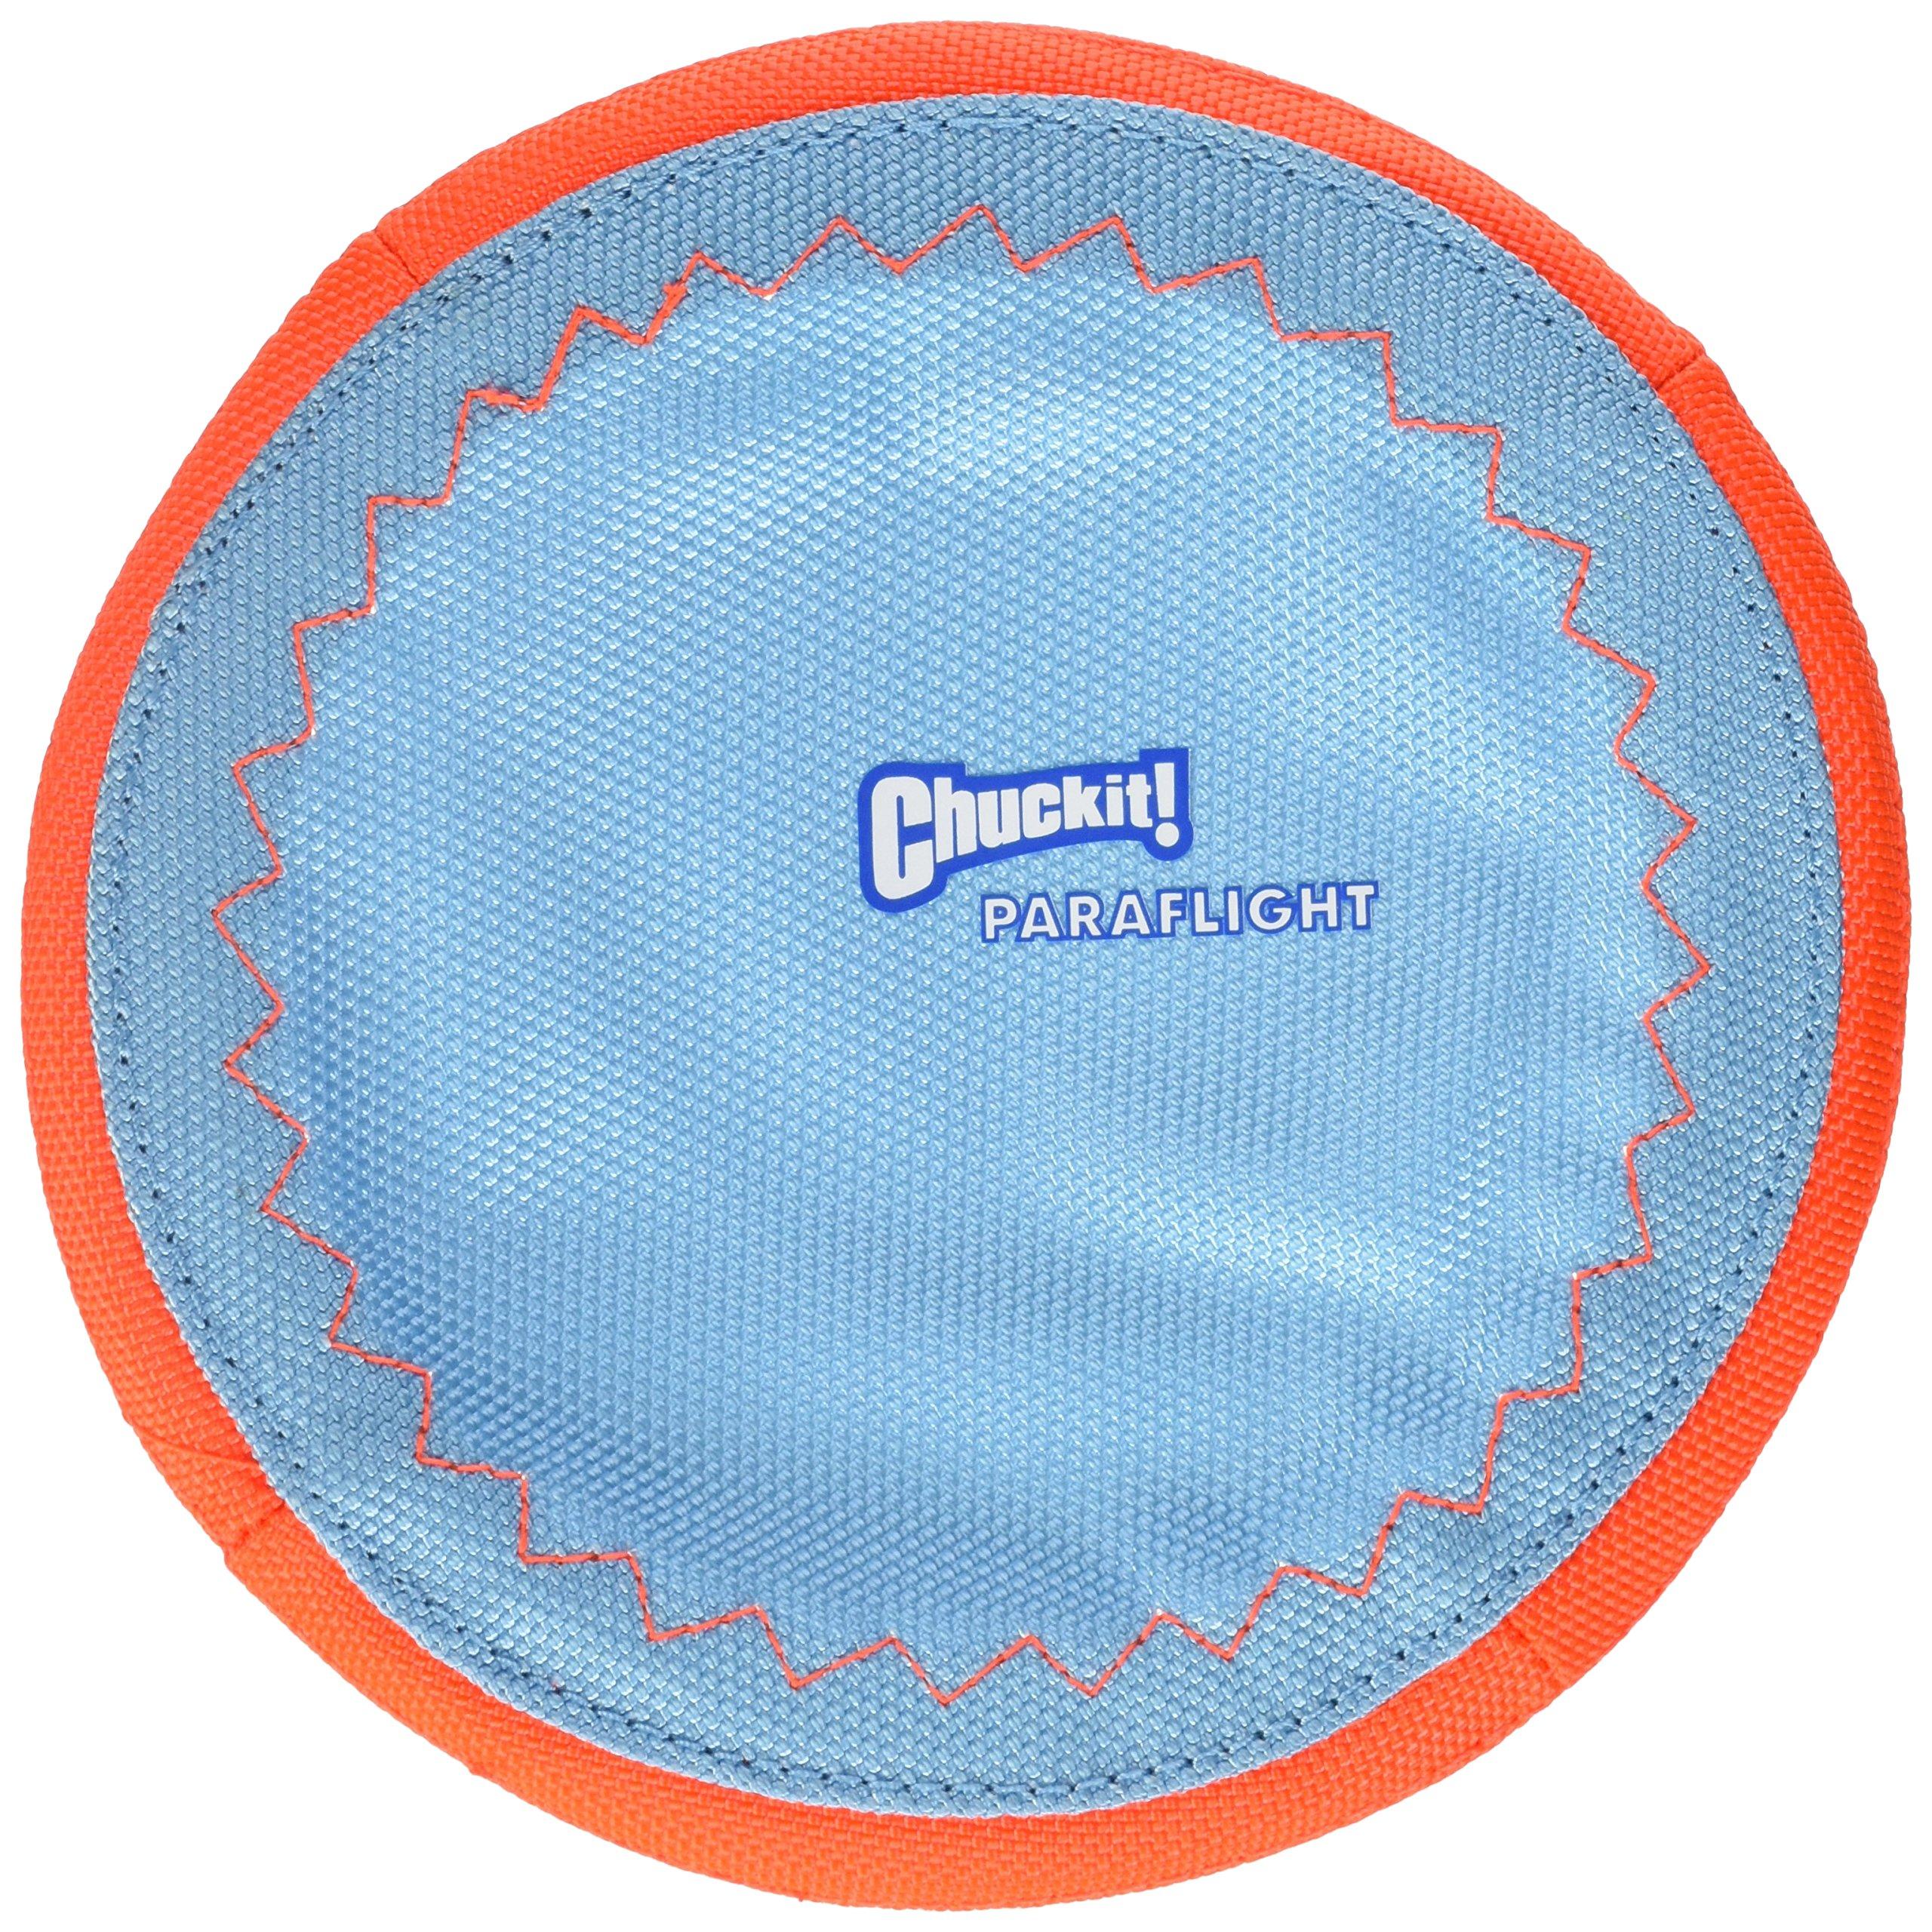 Chuckit! Paraflight Dog Toy Blue/Orange Small